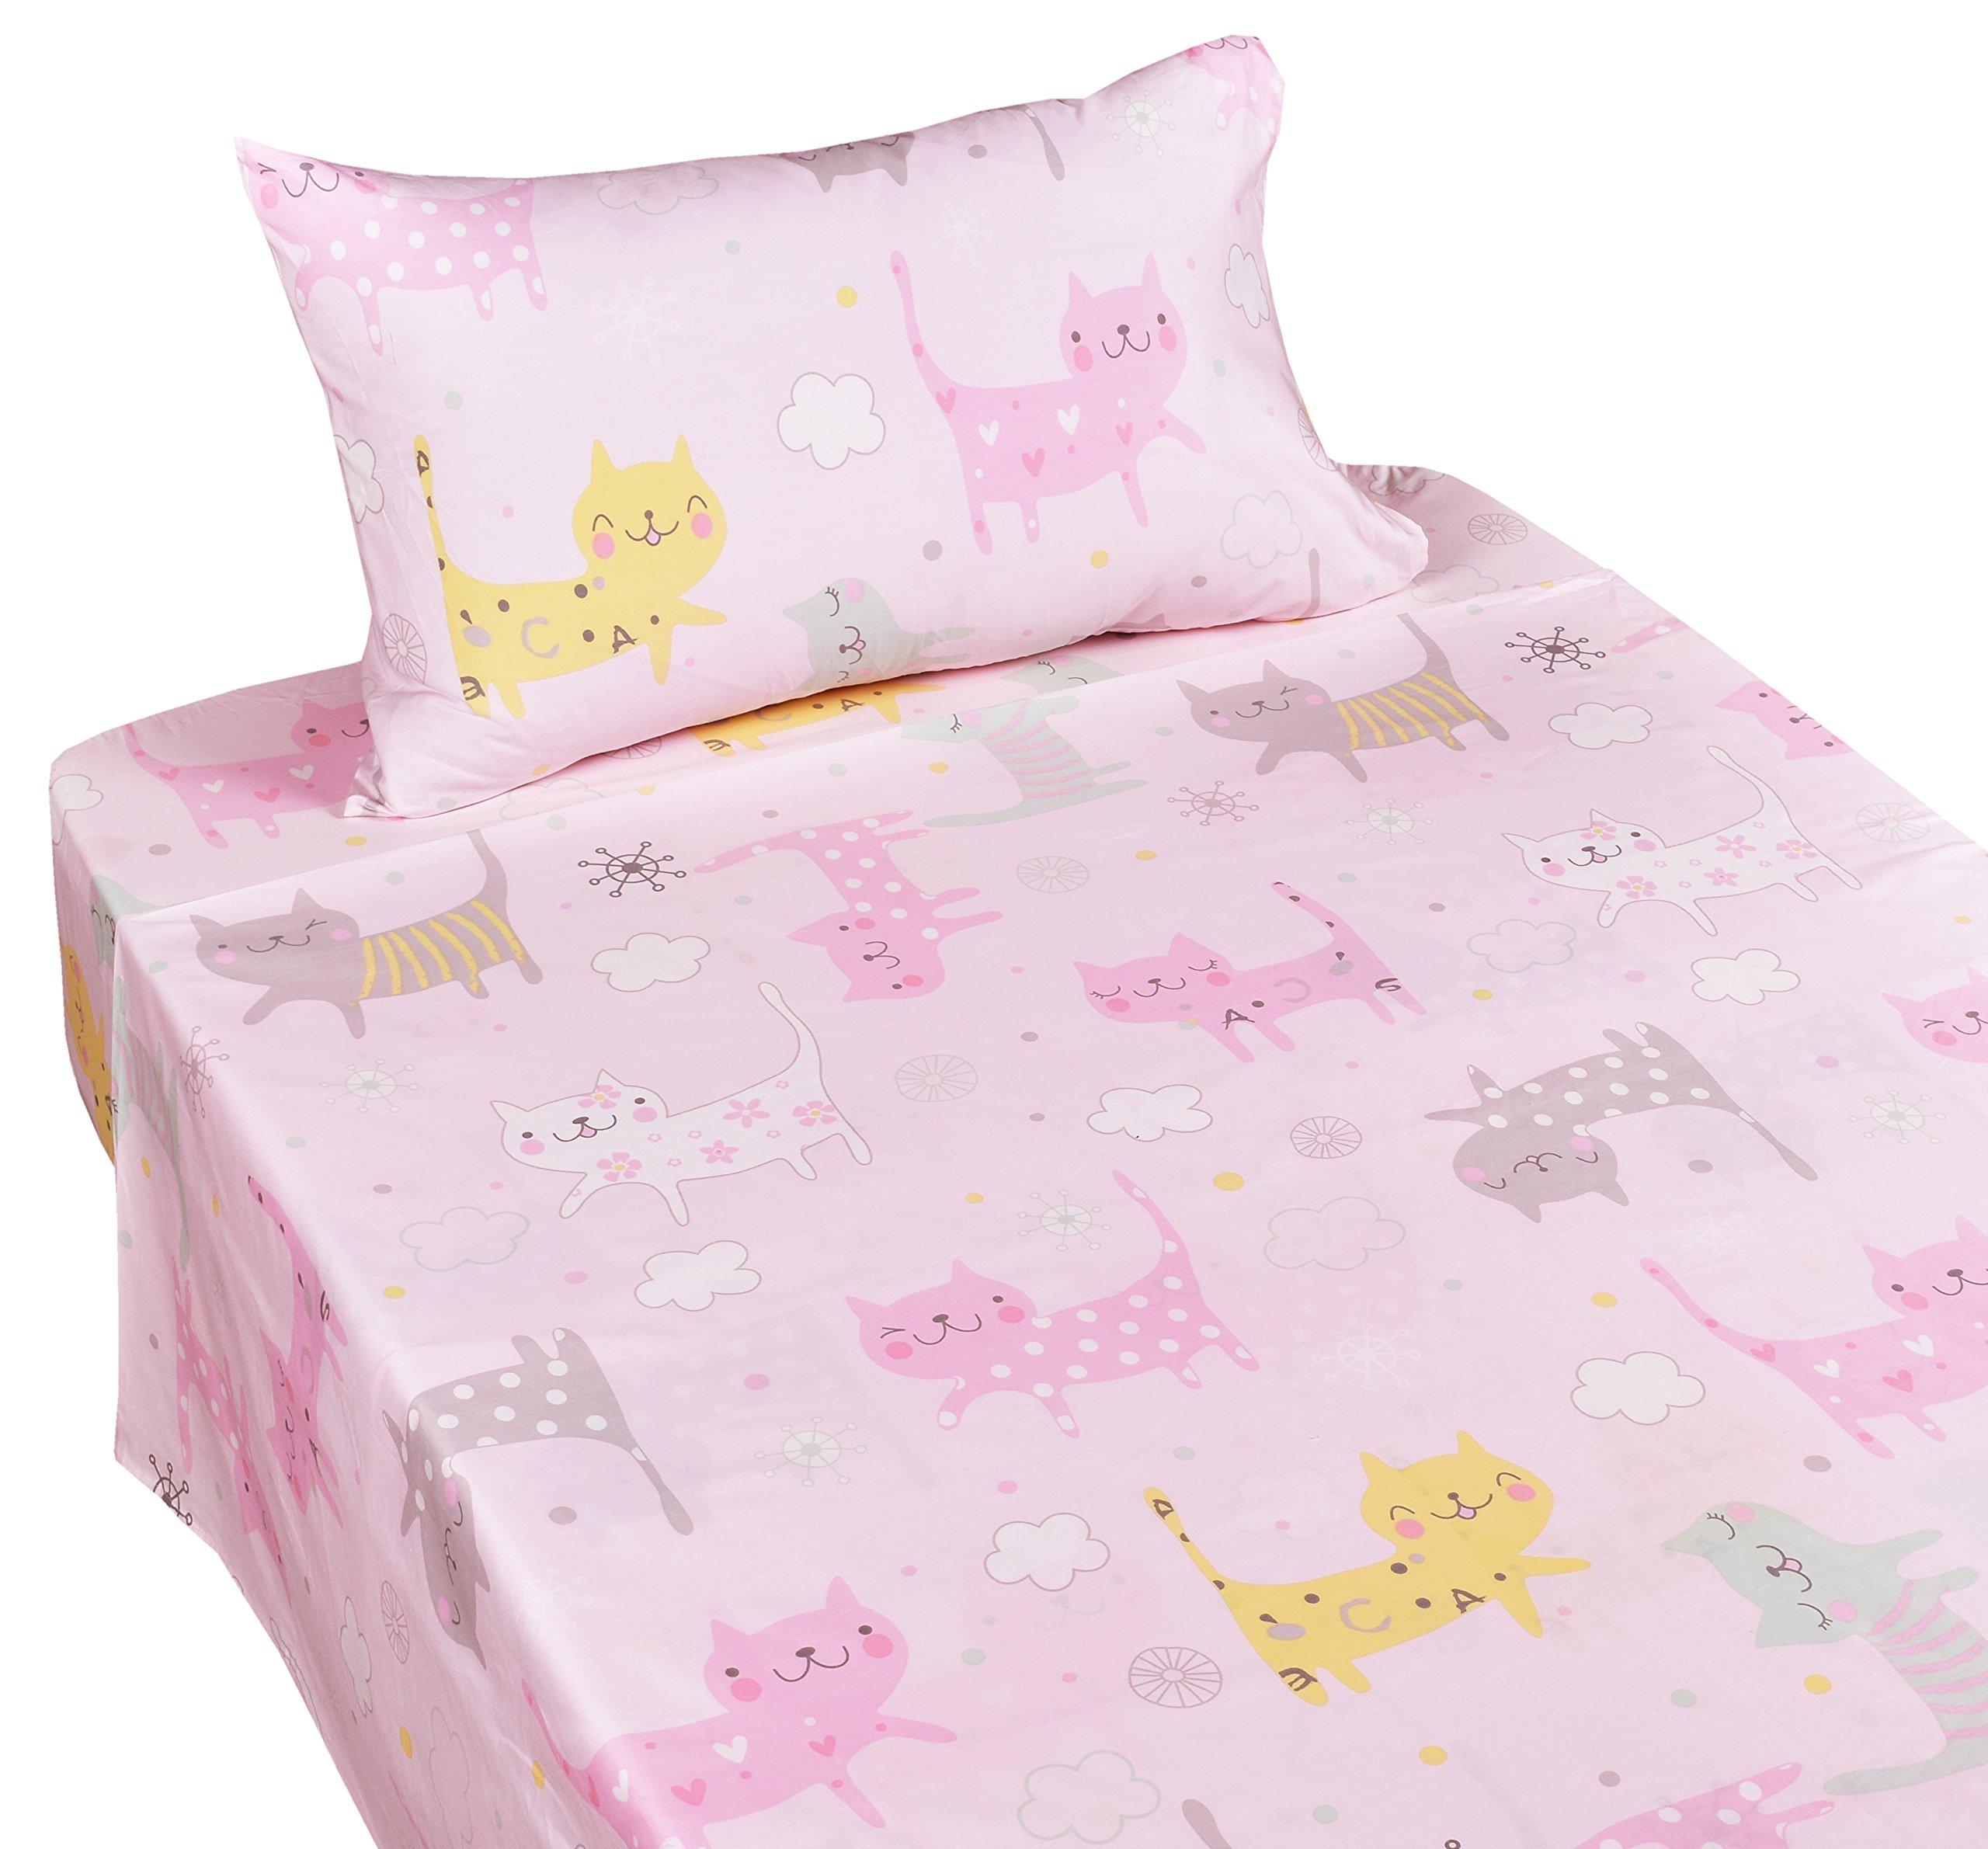 J-pinno Kids Boy Girl Cute Kitty Cats Mouse Twin Sheet Set for Kids Boy Girl Children,100% Cotton, Flat Sheet + Fitted Sheet + Pillowcase Bedding Set (cat)